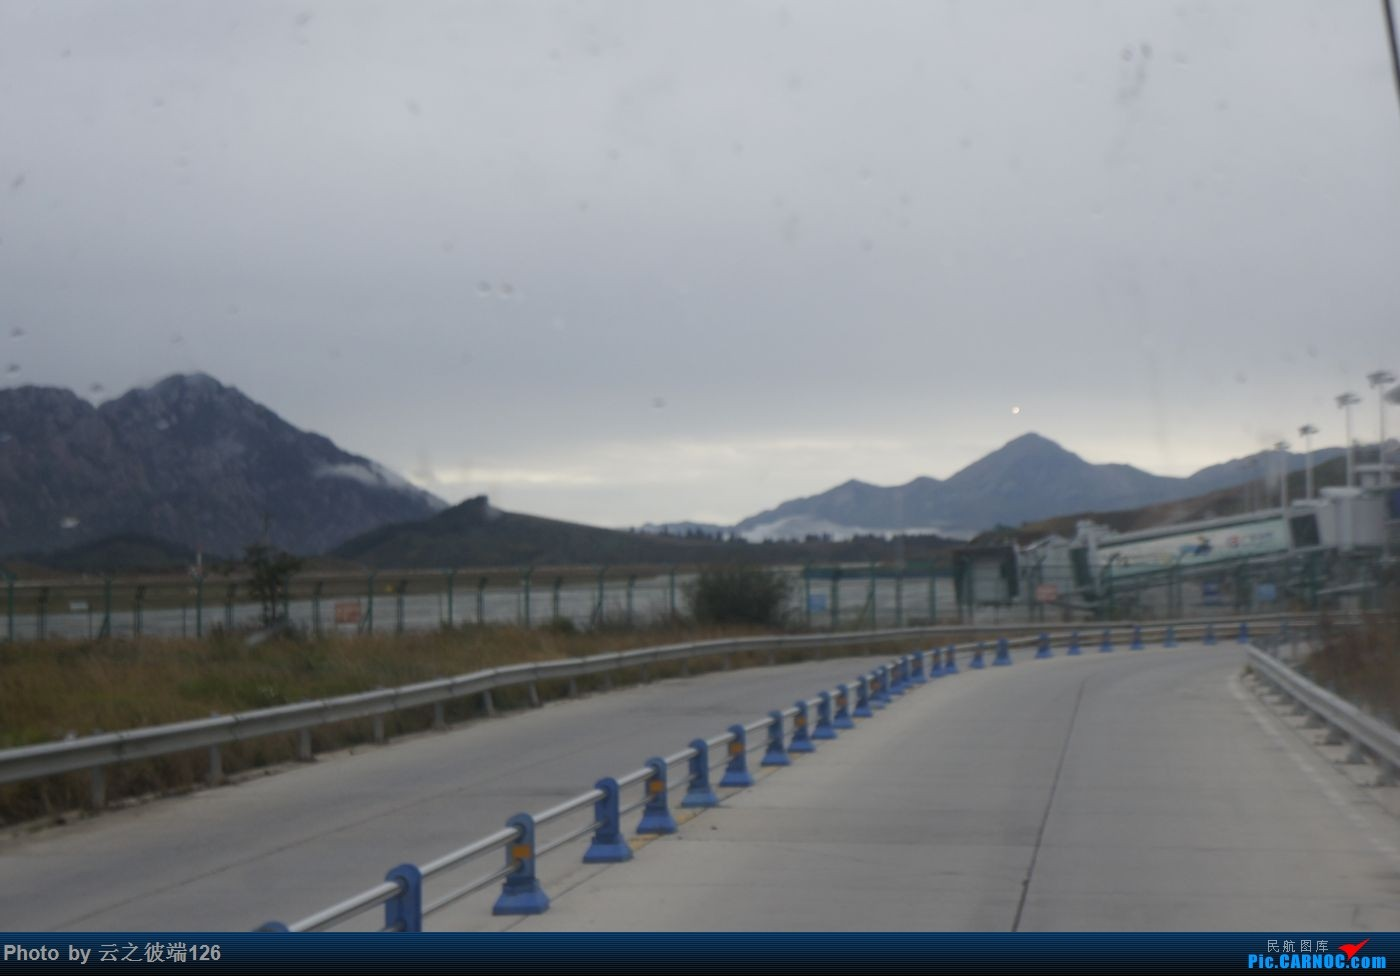 Re:KHN-CTU-JZH-CTU-NKG造訪蜀地,體驗世界里程最貴機票,多圖